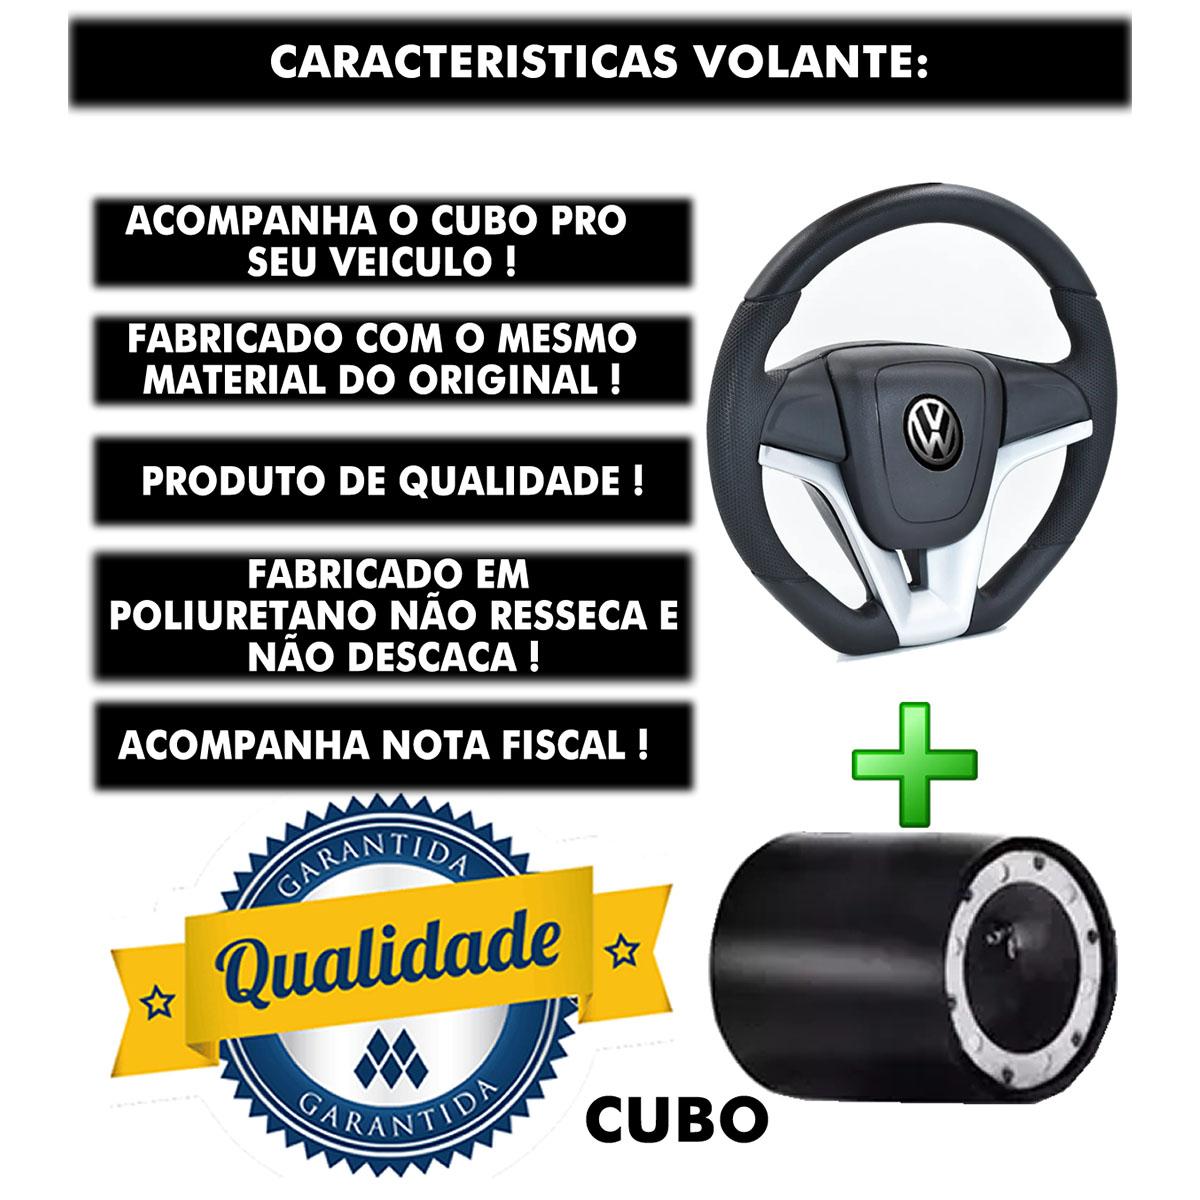 Volante Volkswagen do Camaro Esportivo Cubo Golf Saveiro Parati Fox Voyage Santana Polo Bora Fusca Kombi Poliparts